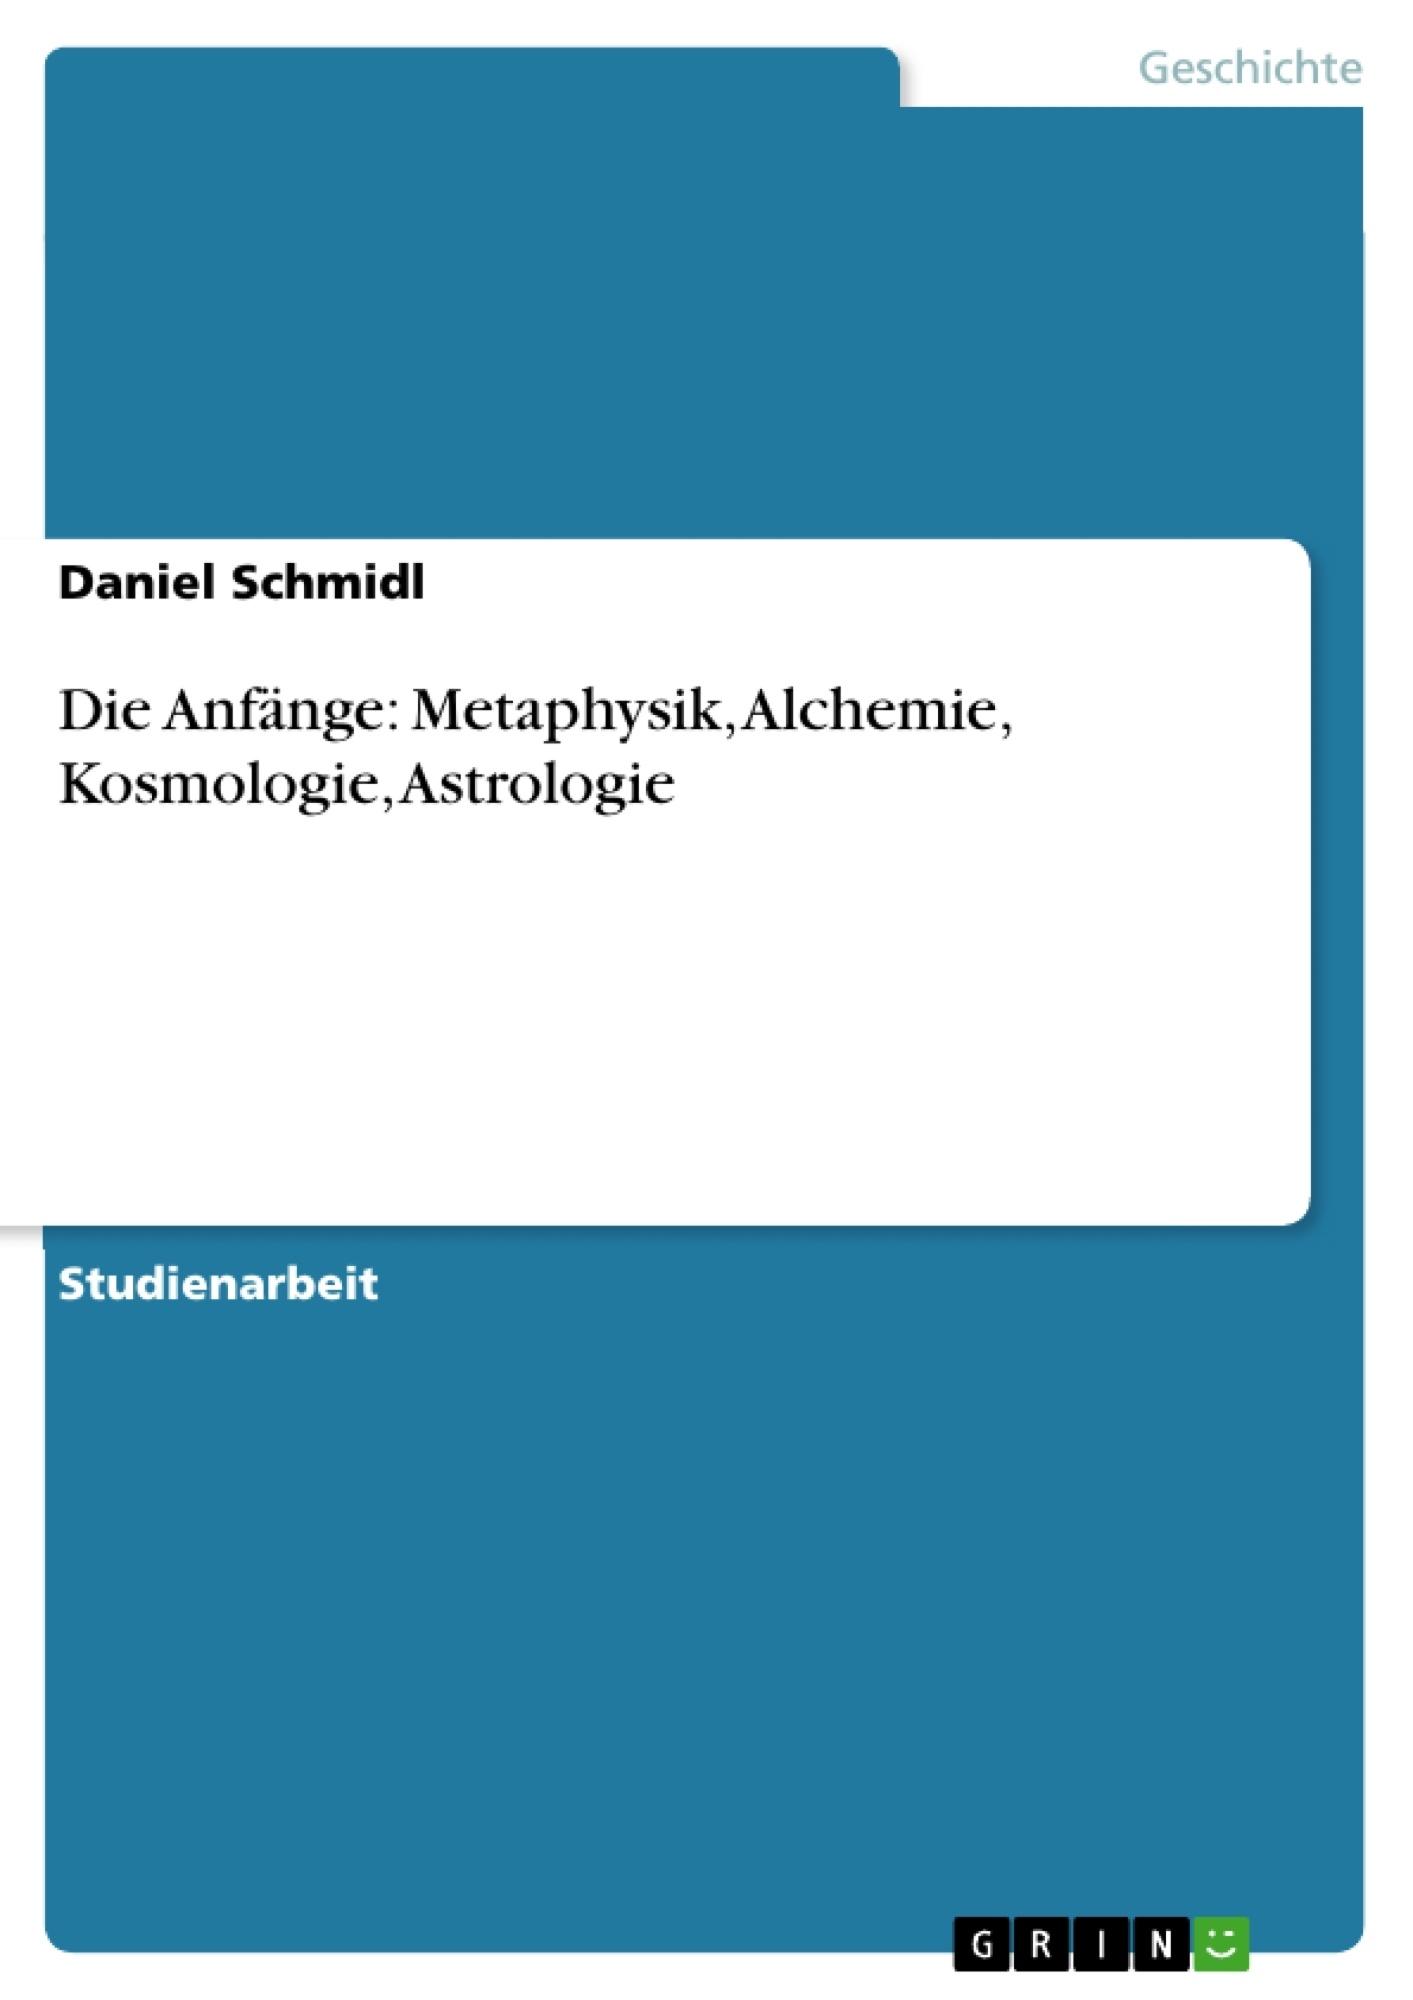 Titel: Die Anfänge: Metaphysik, Alchemie, Kosmologie, Astrologie